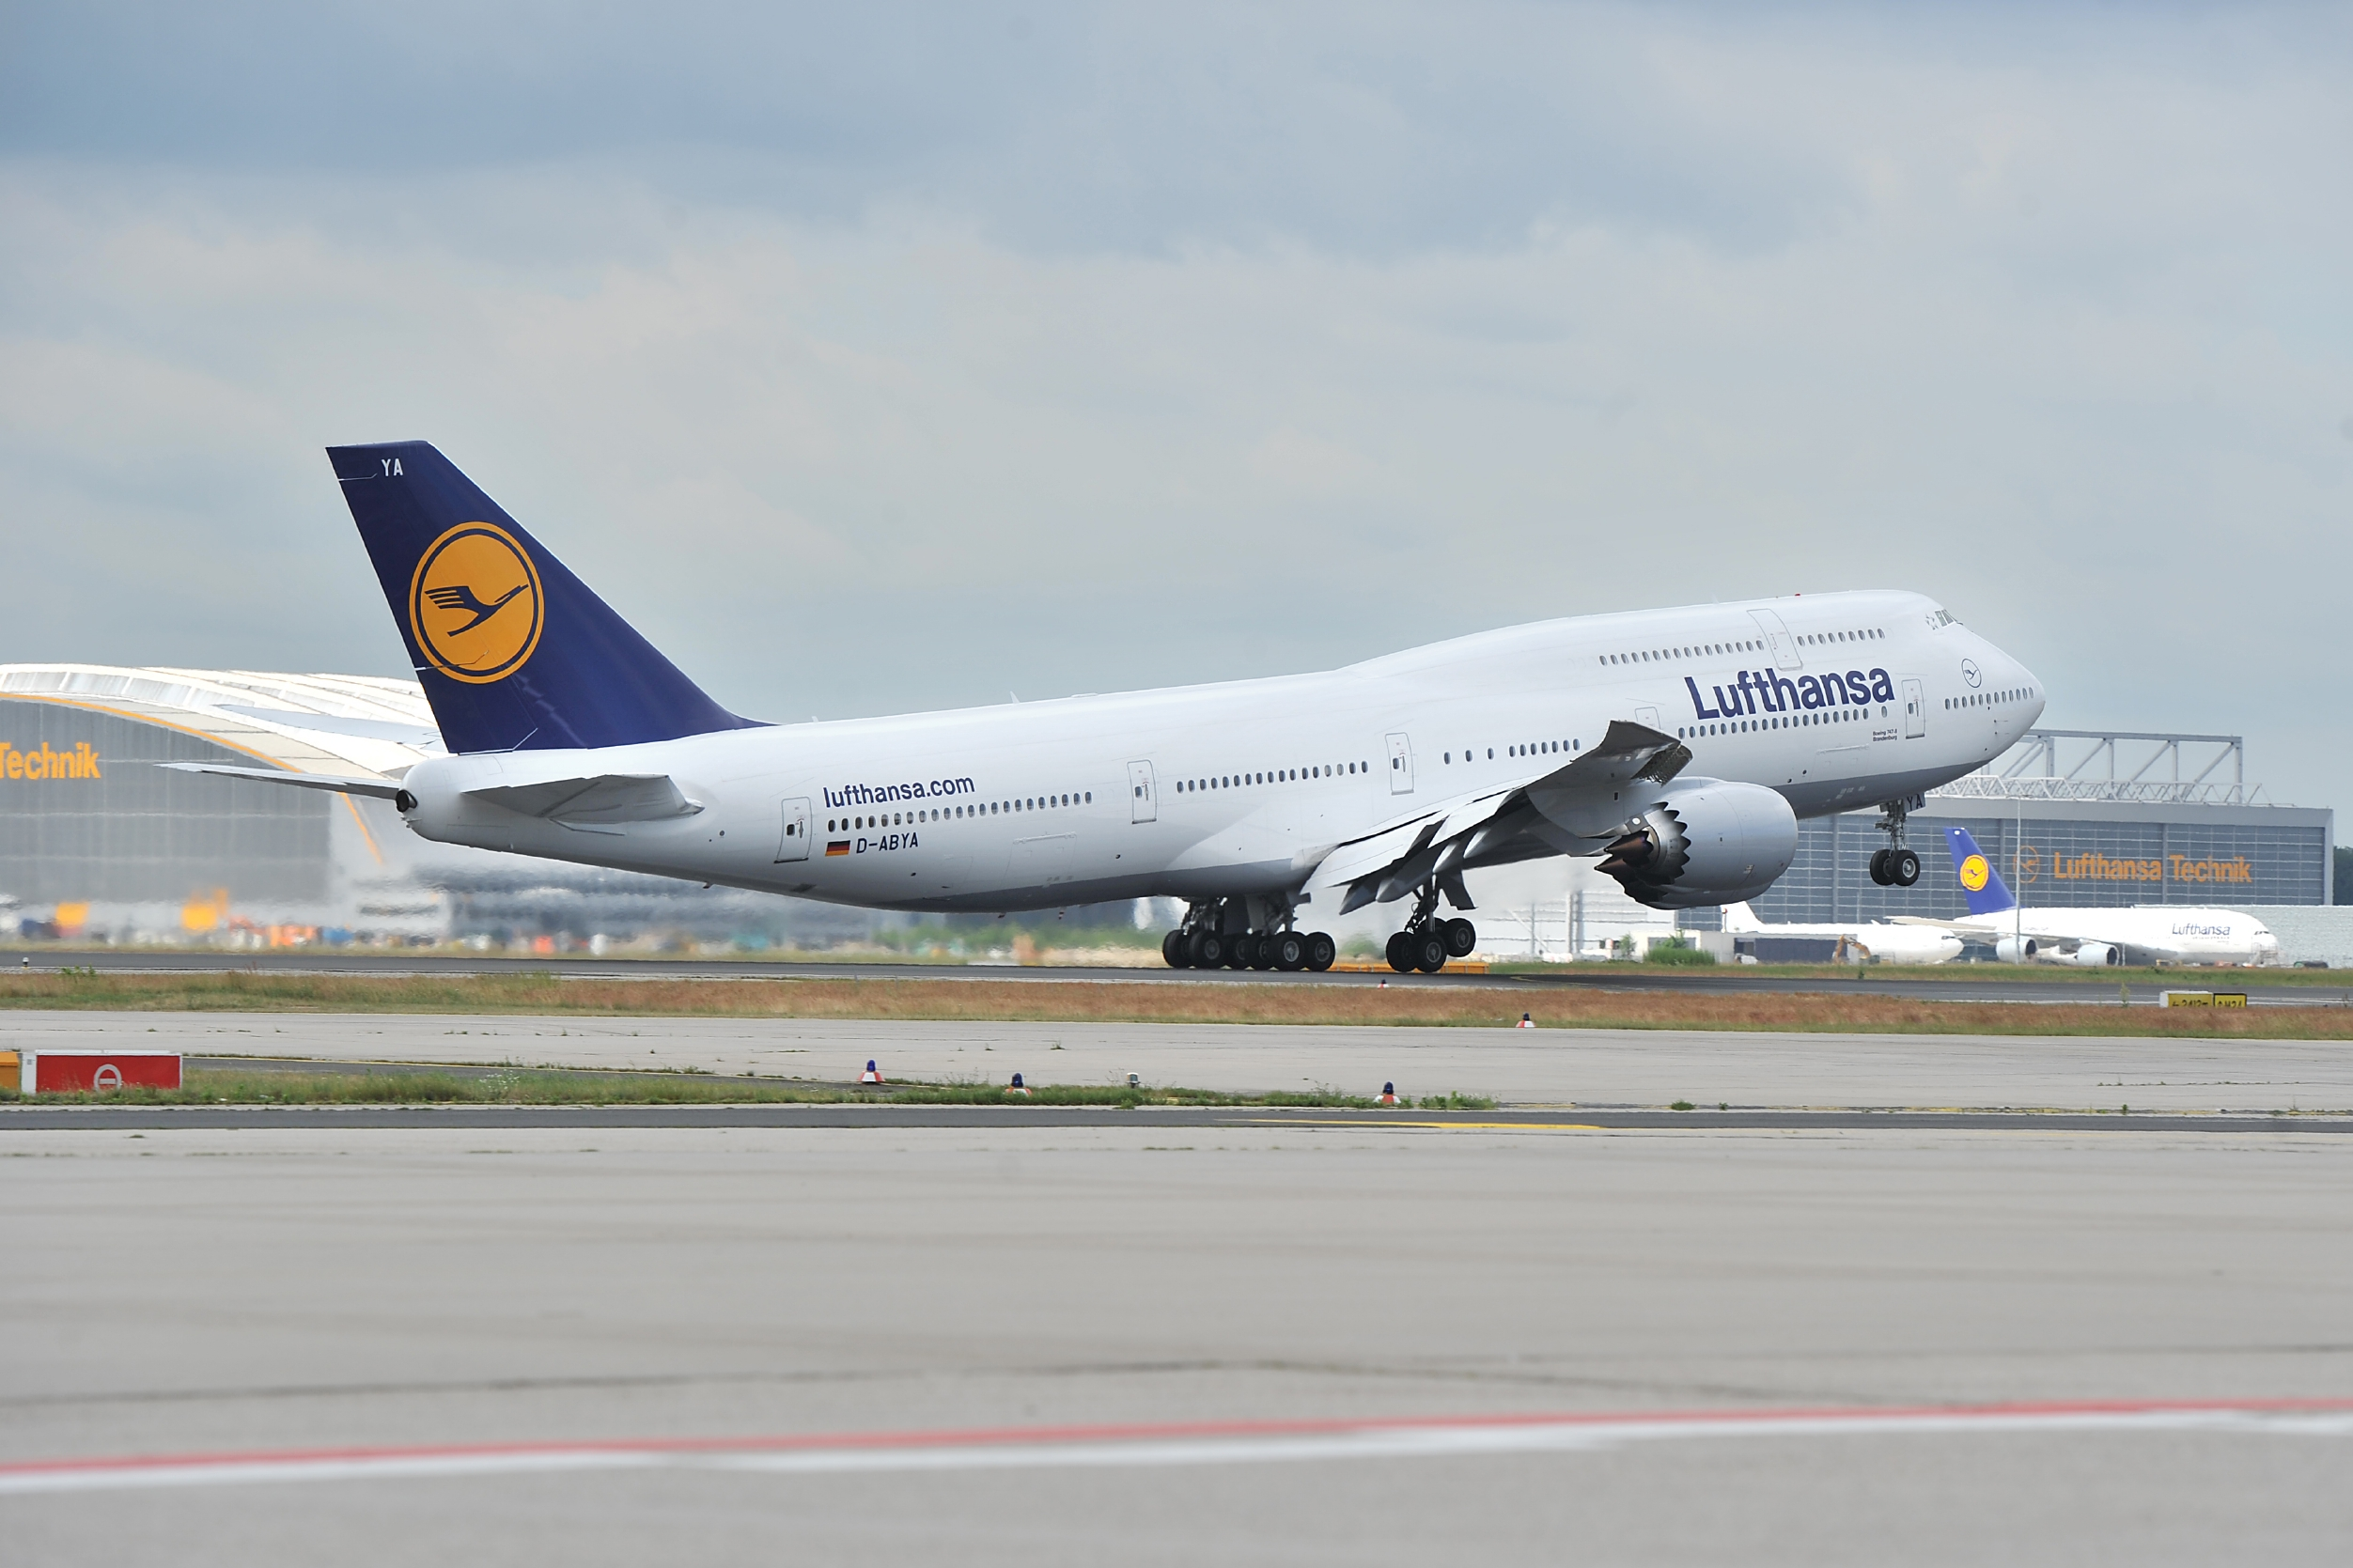 LufthansaFrankfurt